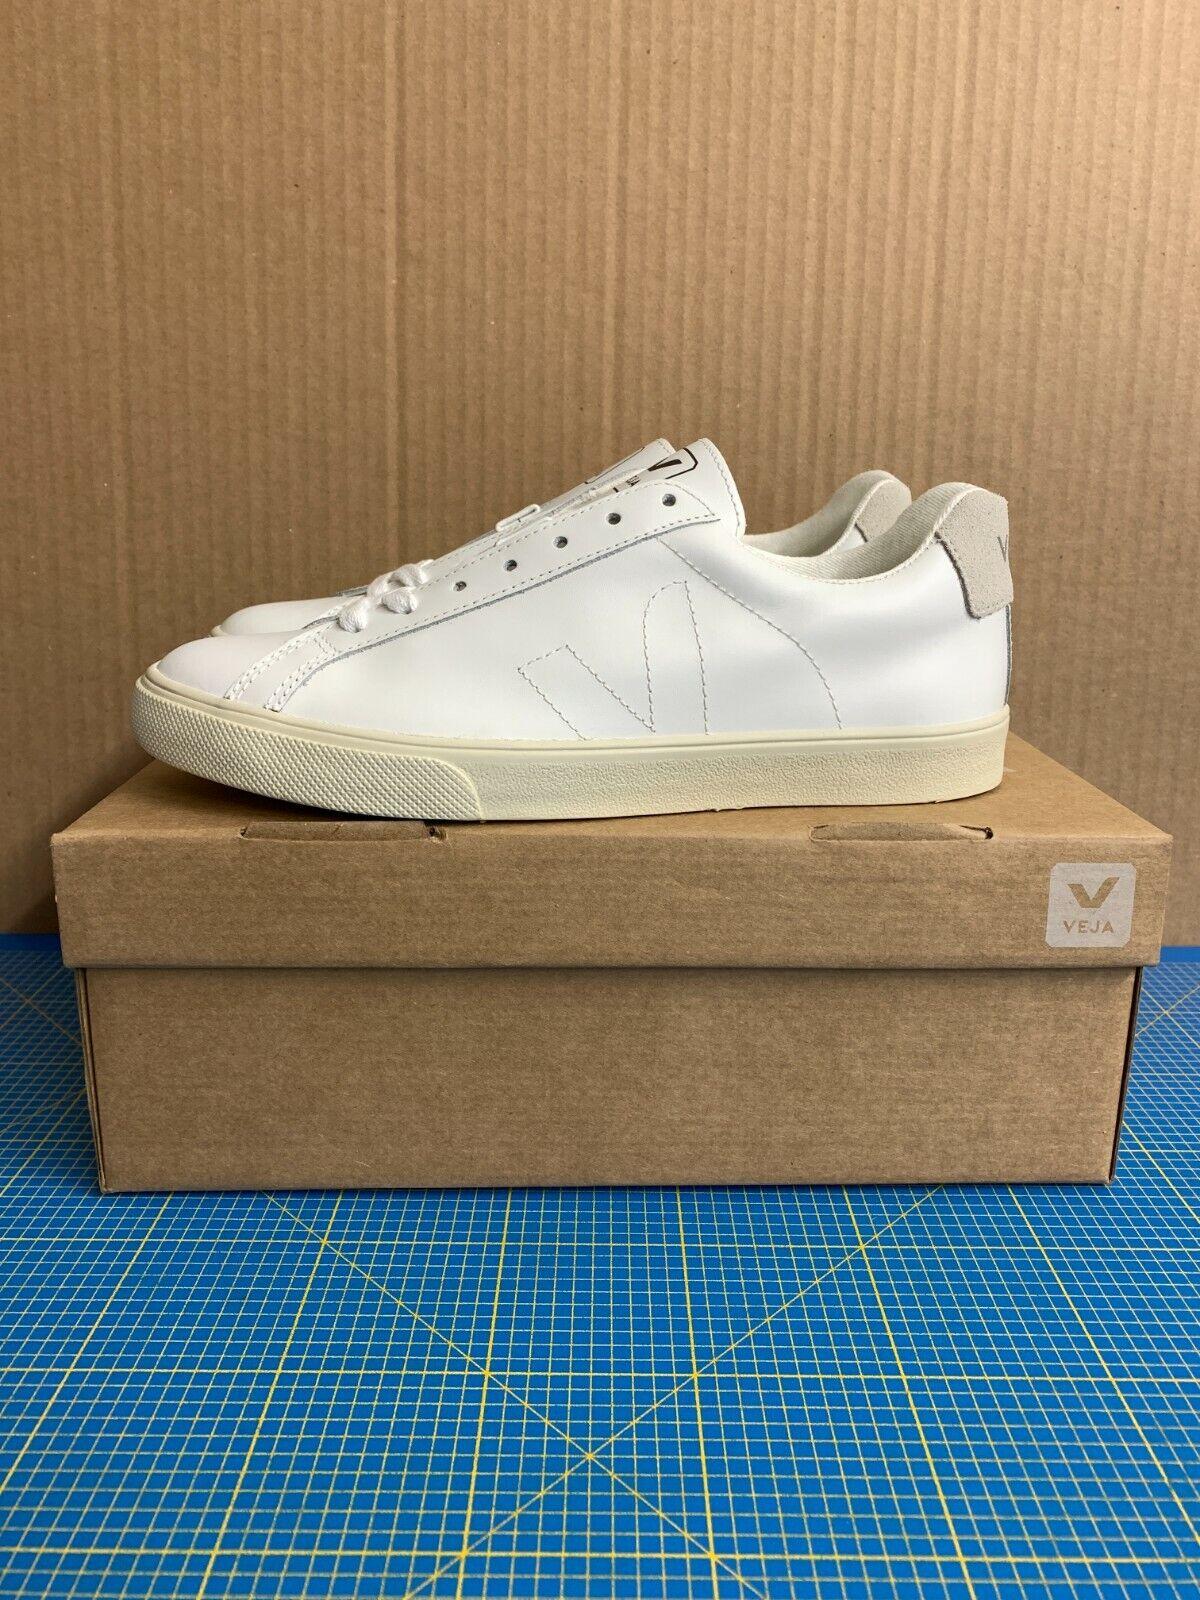 Veja Esplar Leather Extra White Damen Schuhe Grösse: EUR 39